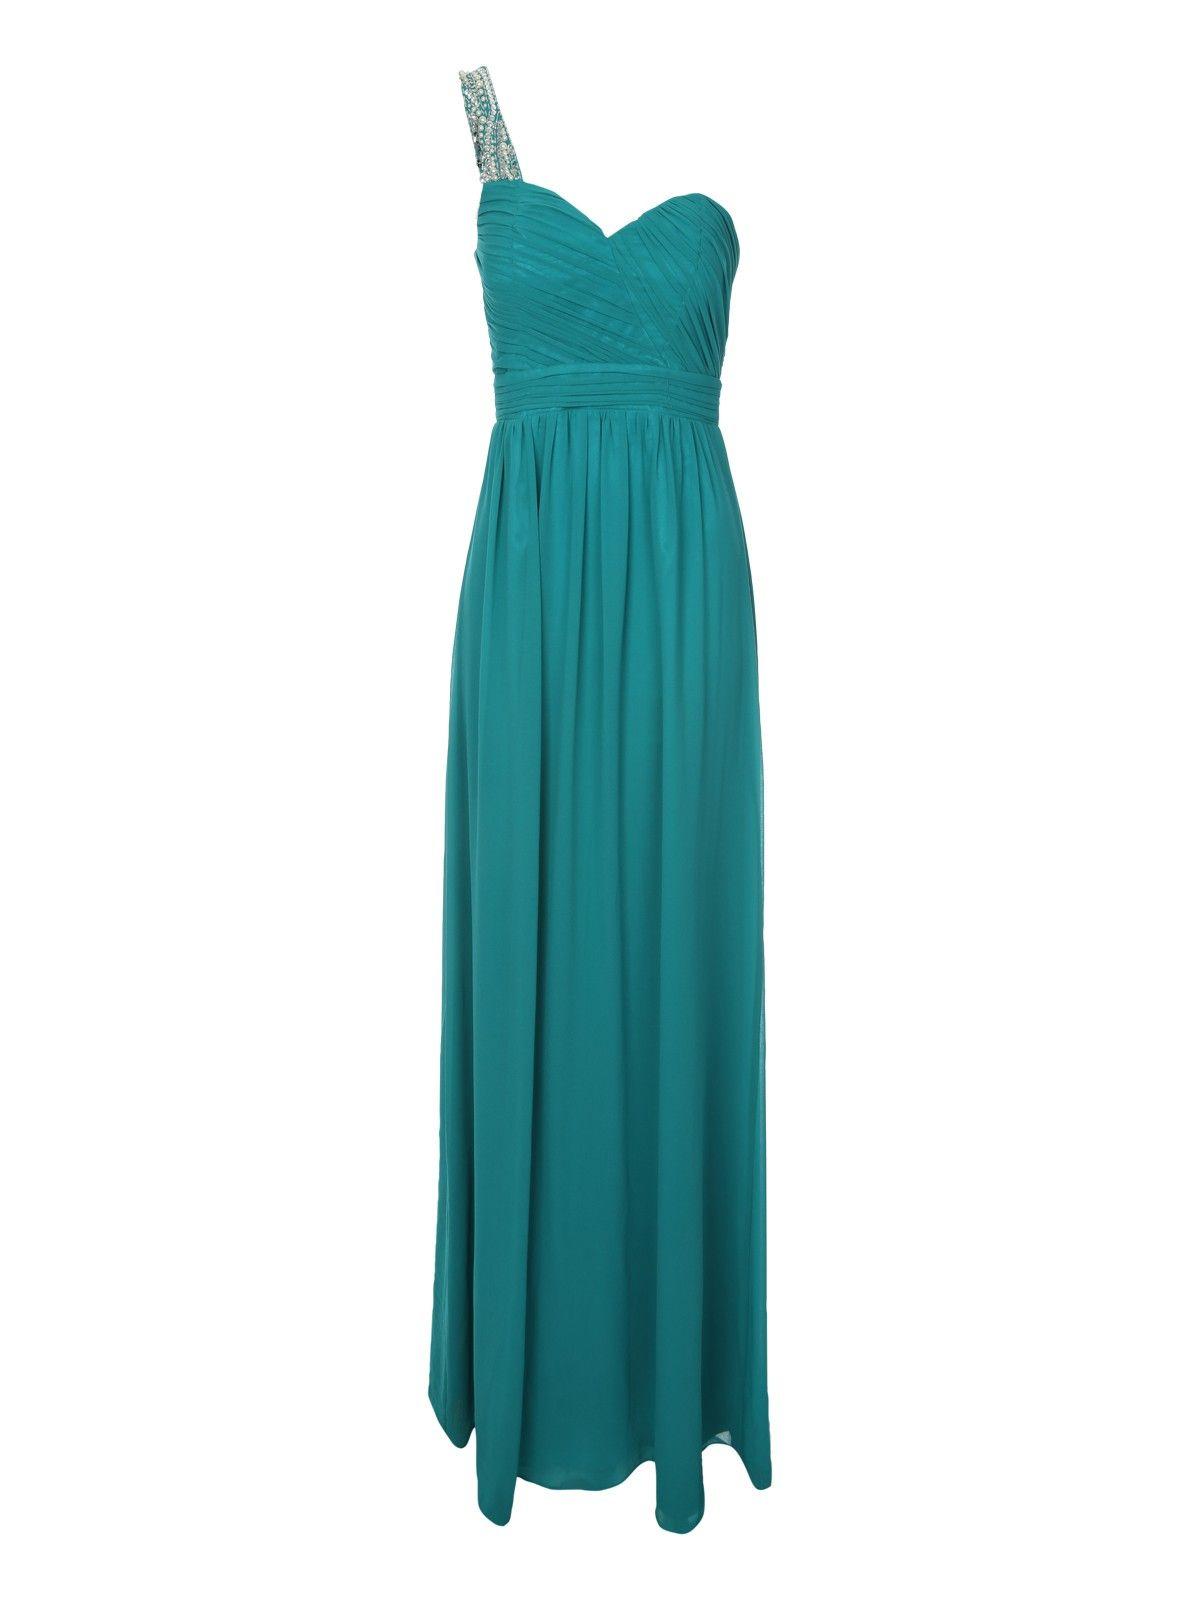 Jane Norman Oriental Pleat Maxi Dress In Black